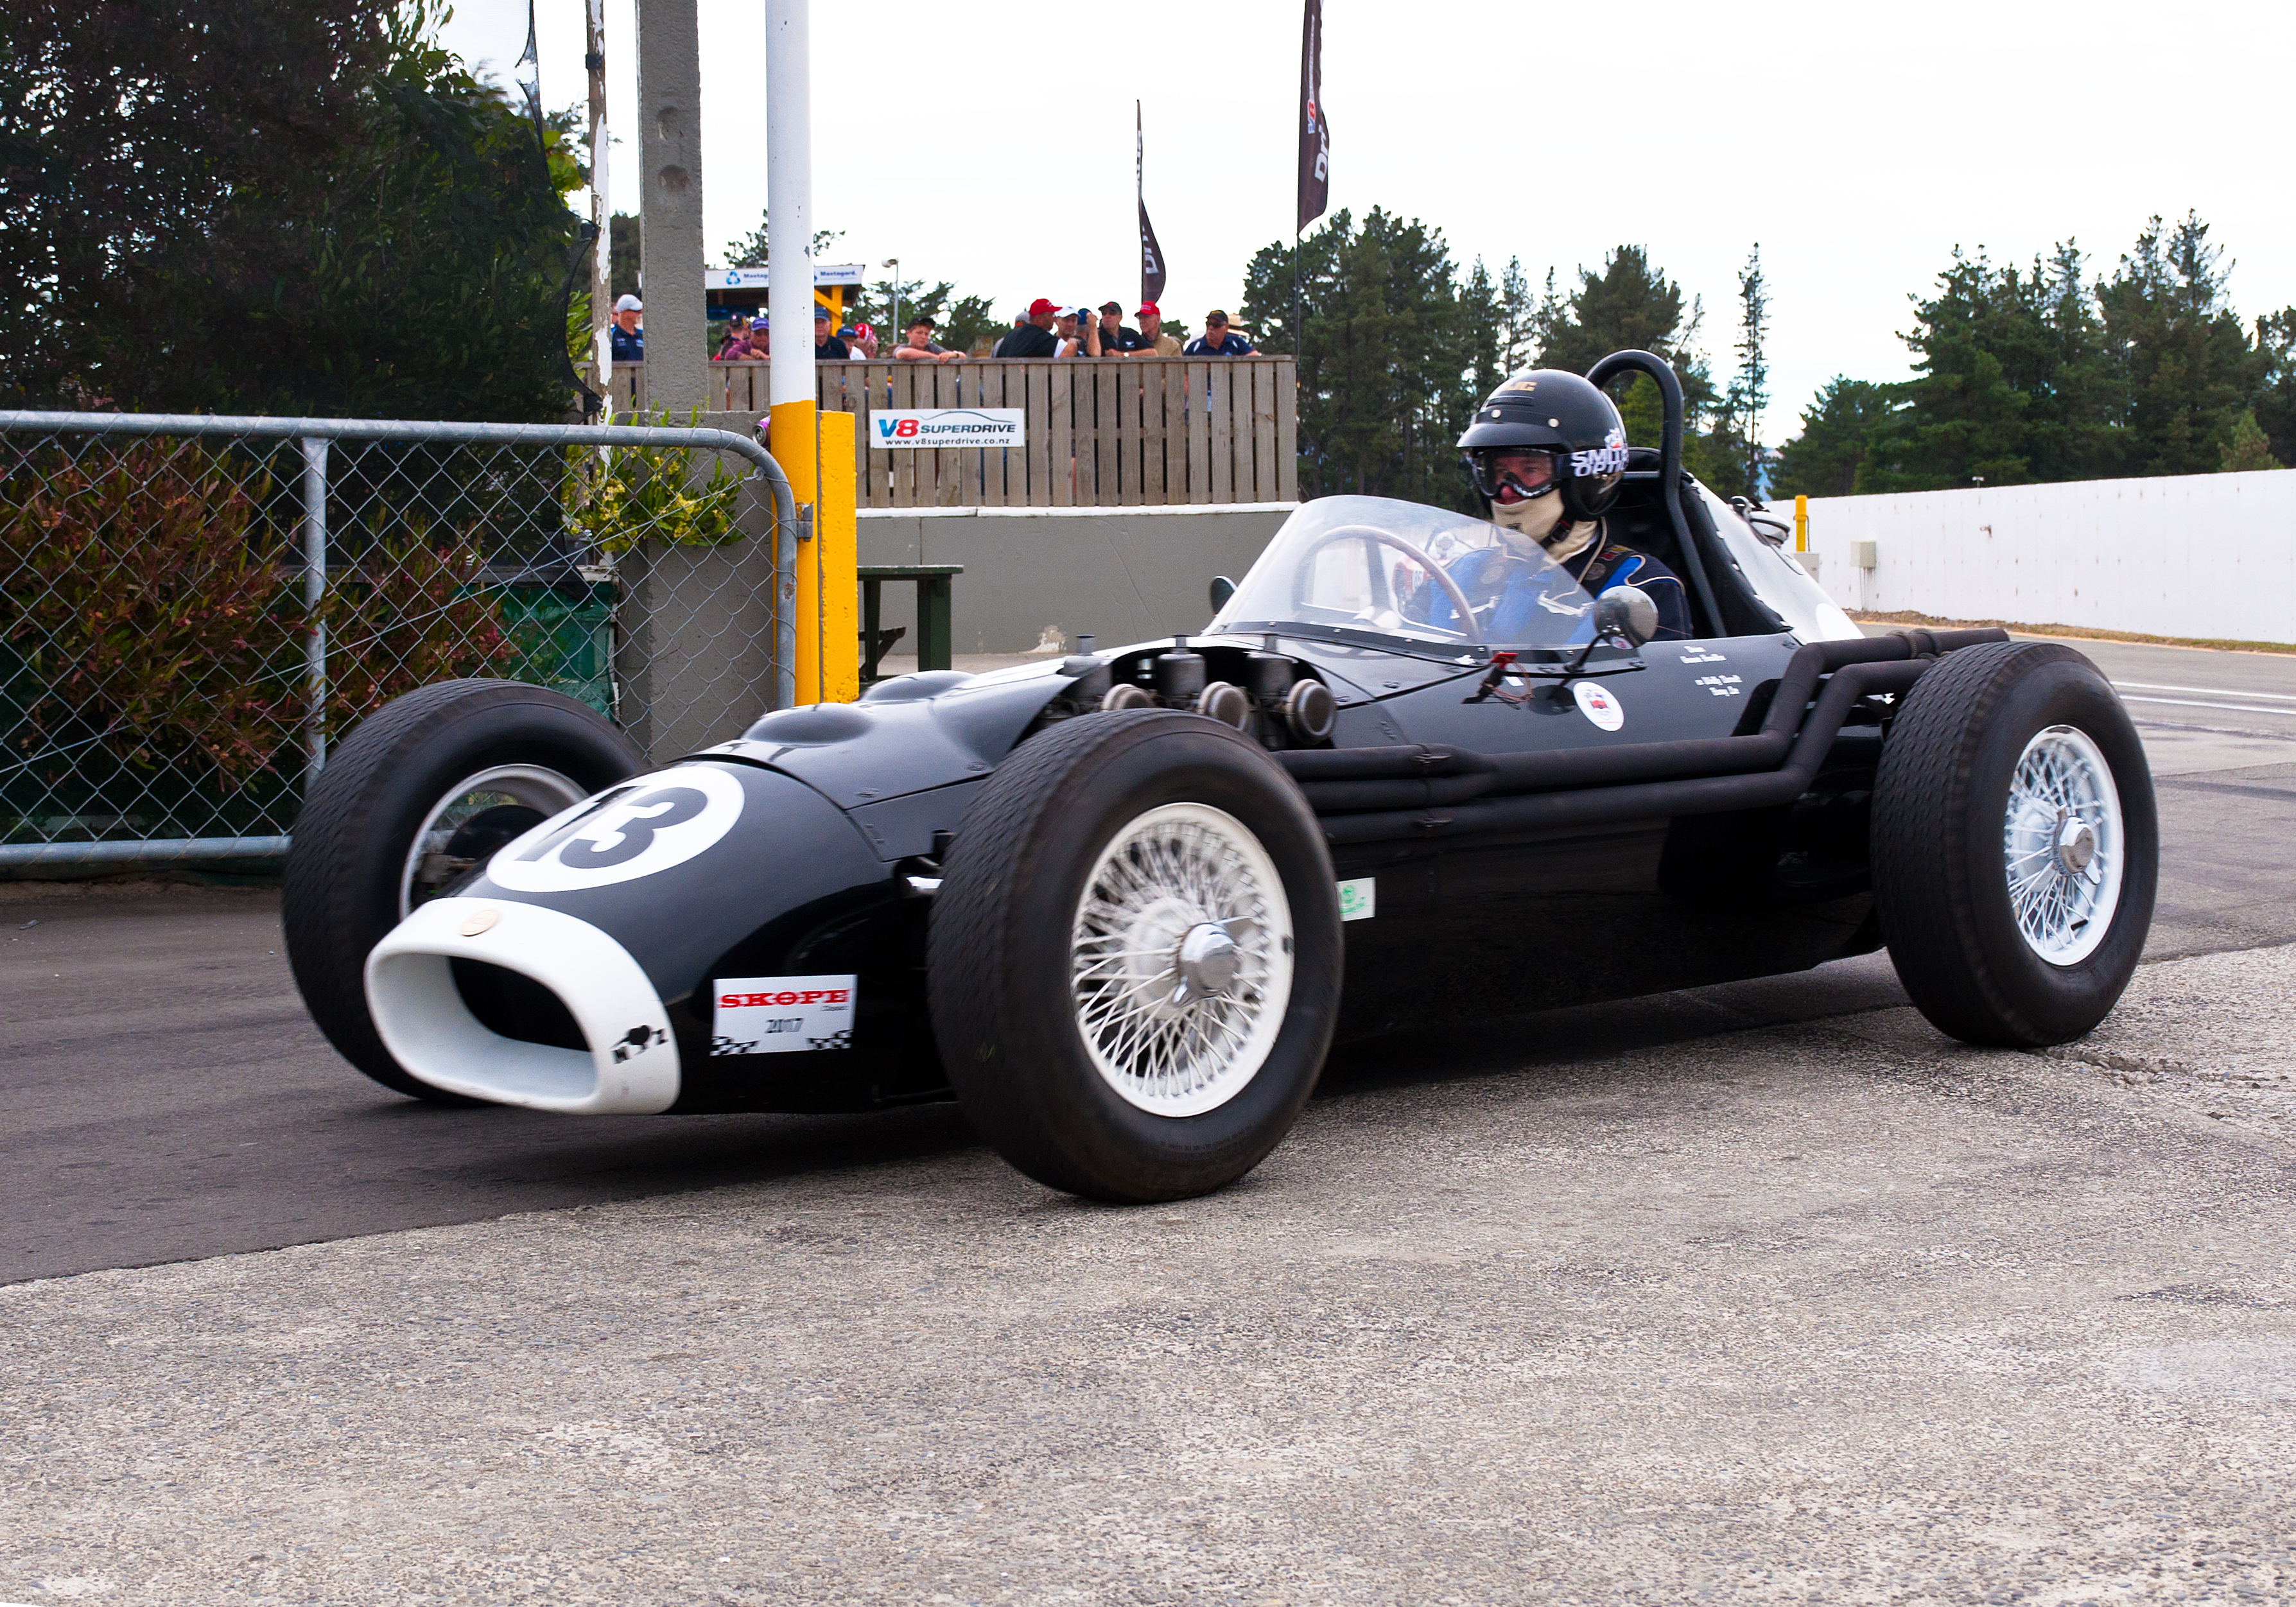 ACE III 1958, Ruapuna, Race car, Sport, Vehicle, HQ Photo